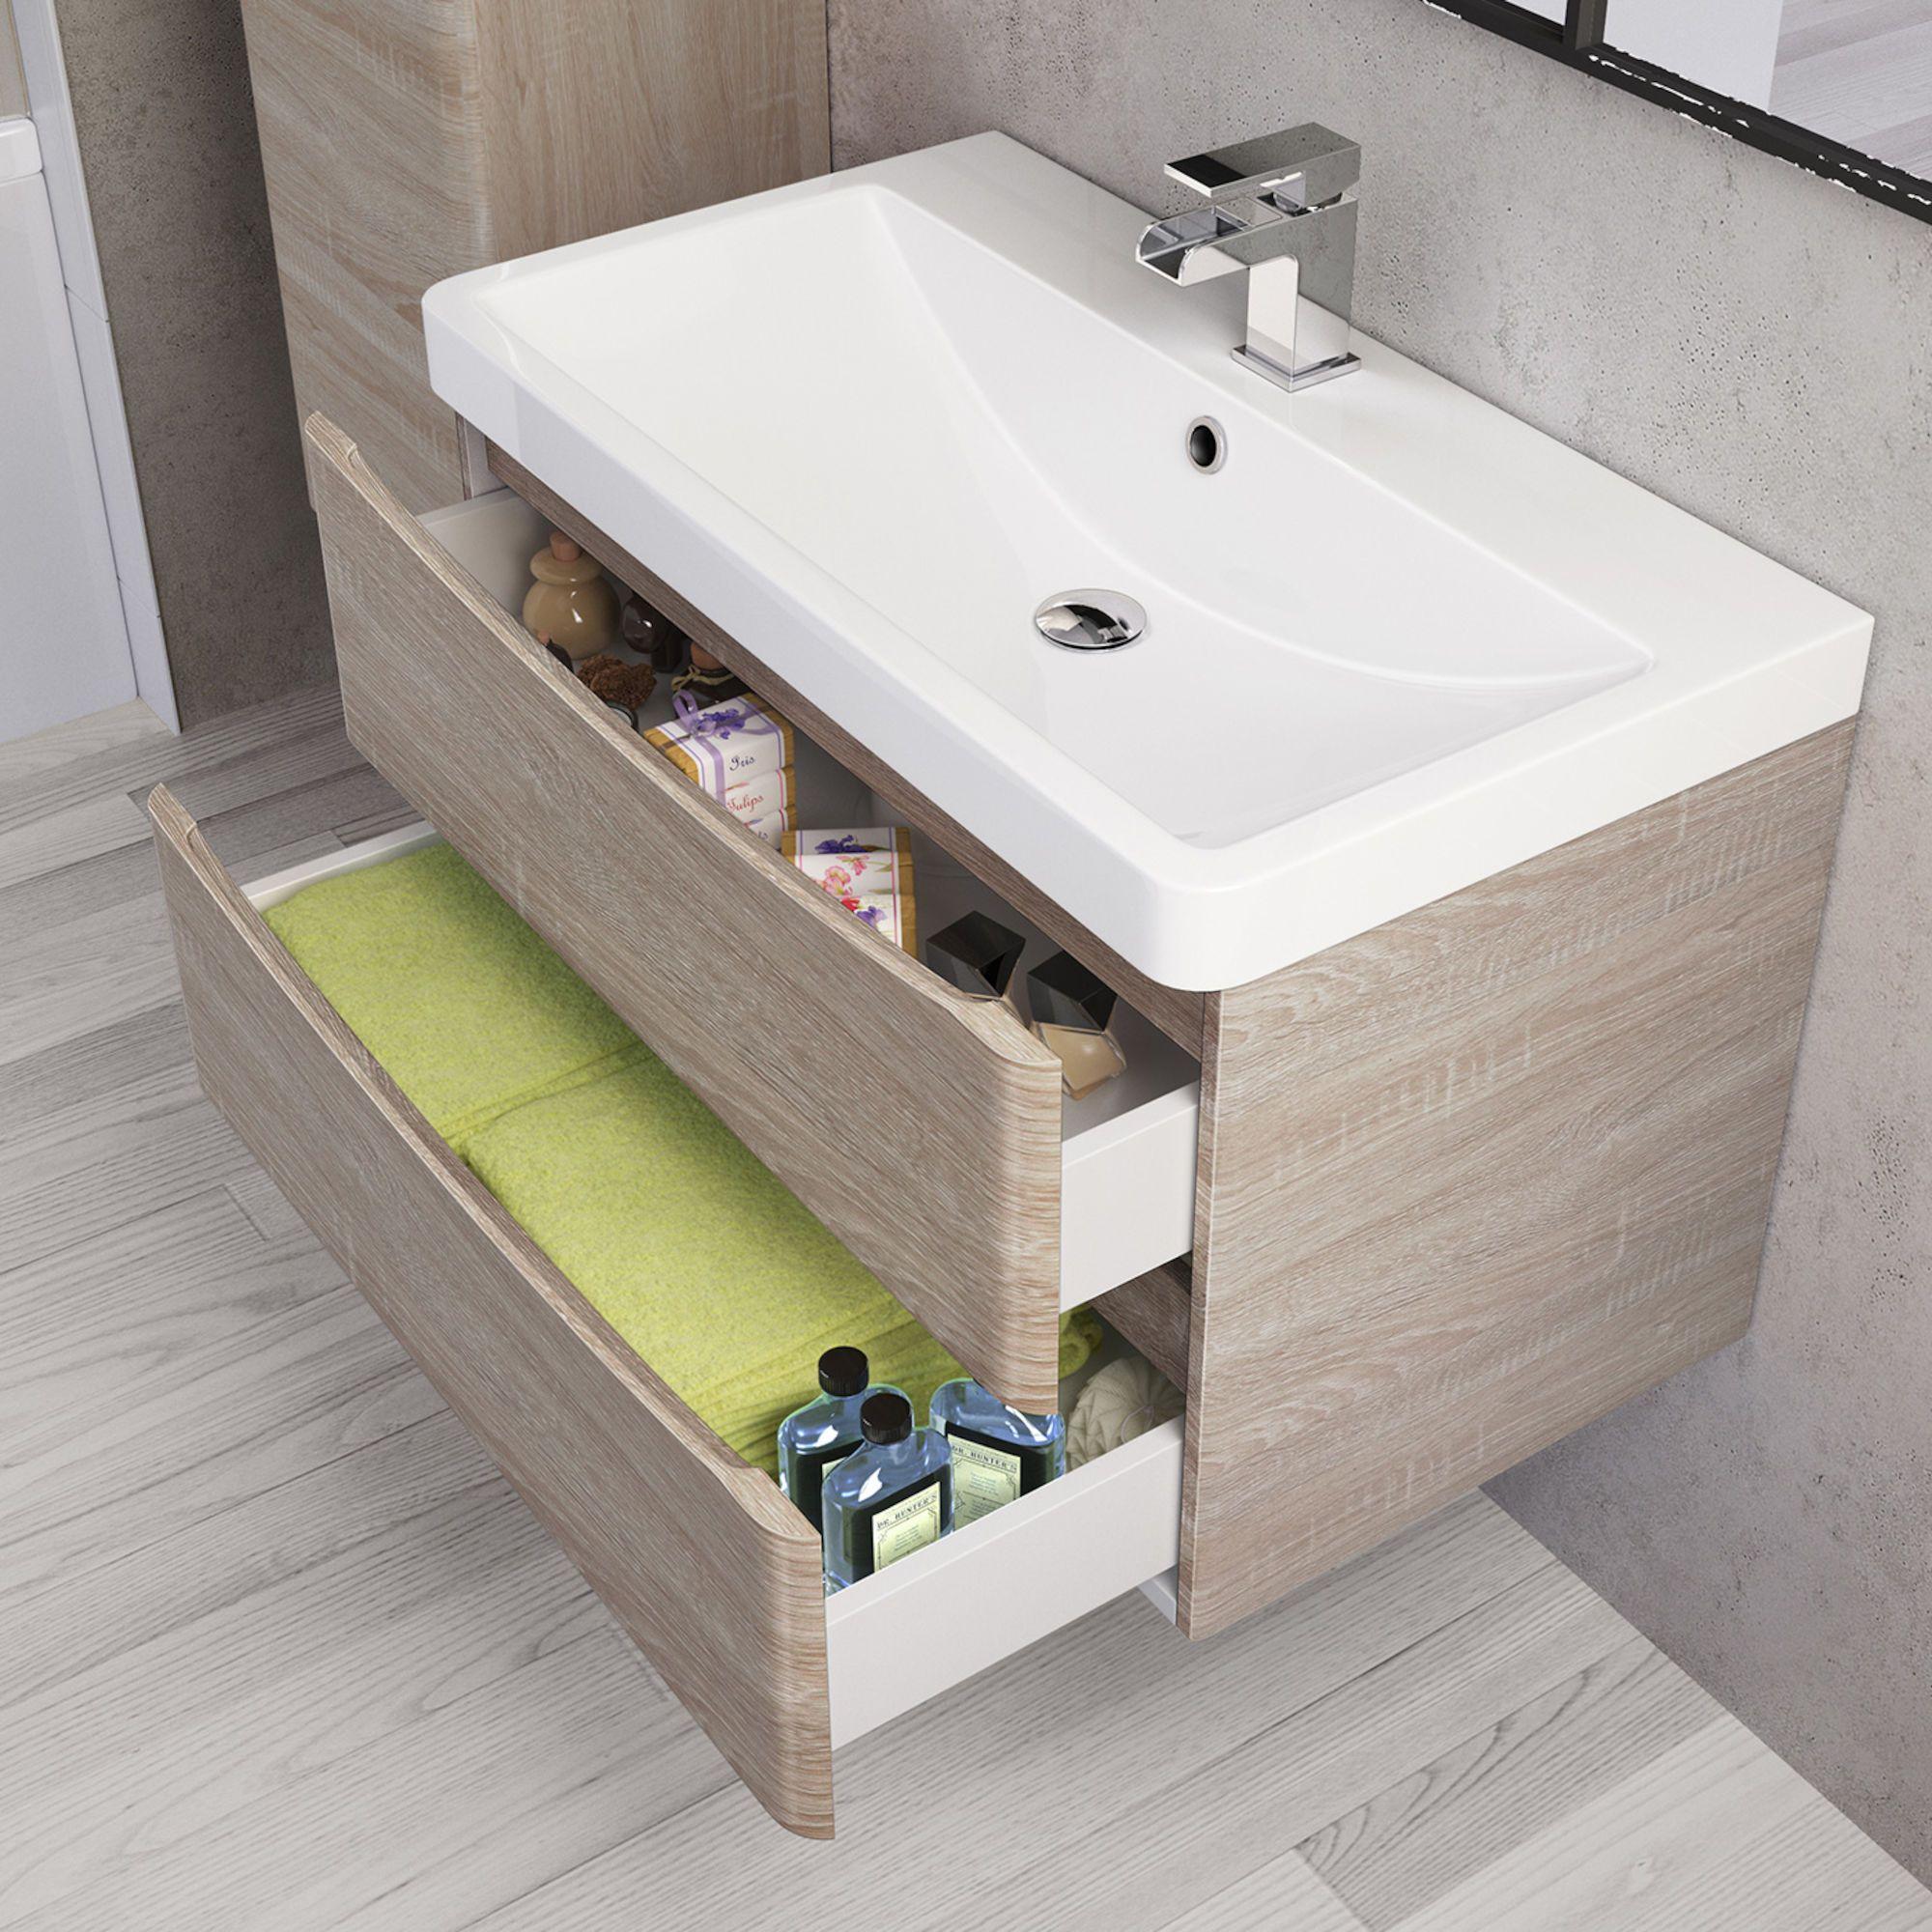 800mm Austin Ii Light Oak Effect Built In Basin Drawer Unit Wall Hung Small Bathroom Furniture Bathroom Sink Units Sink